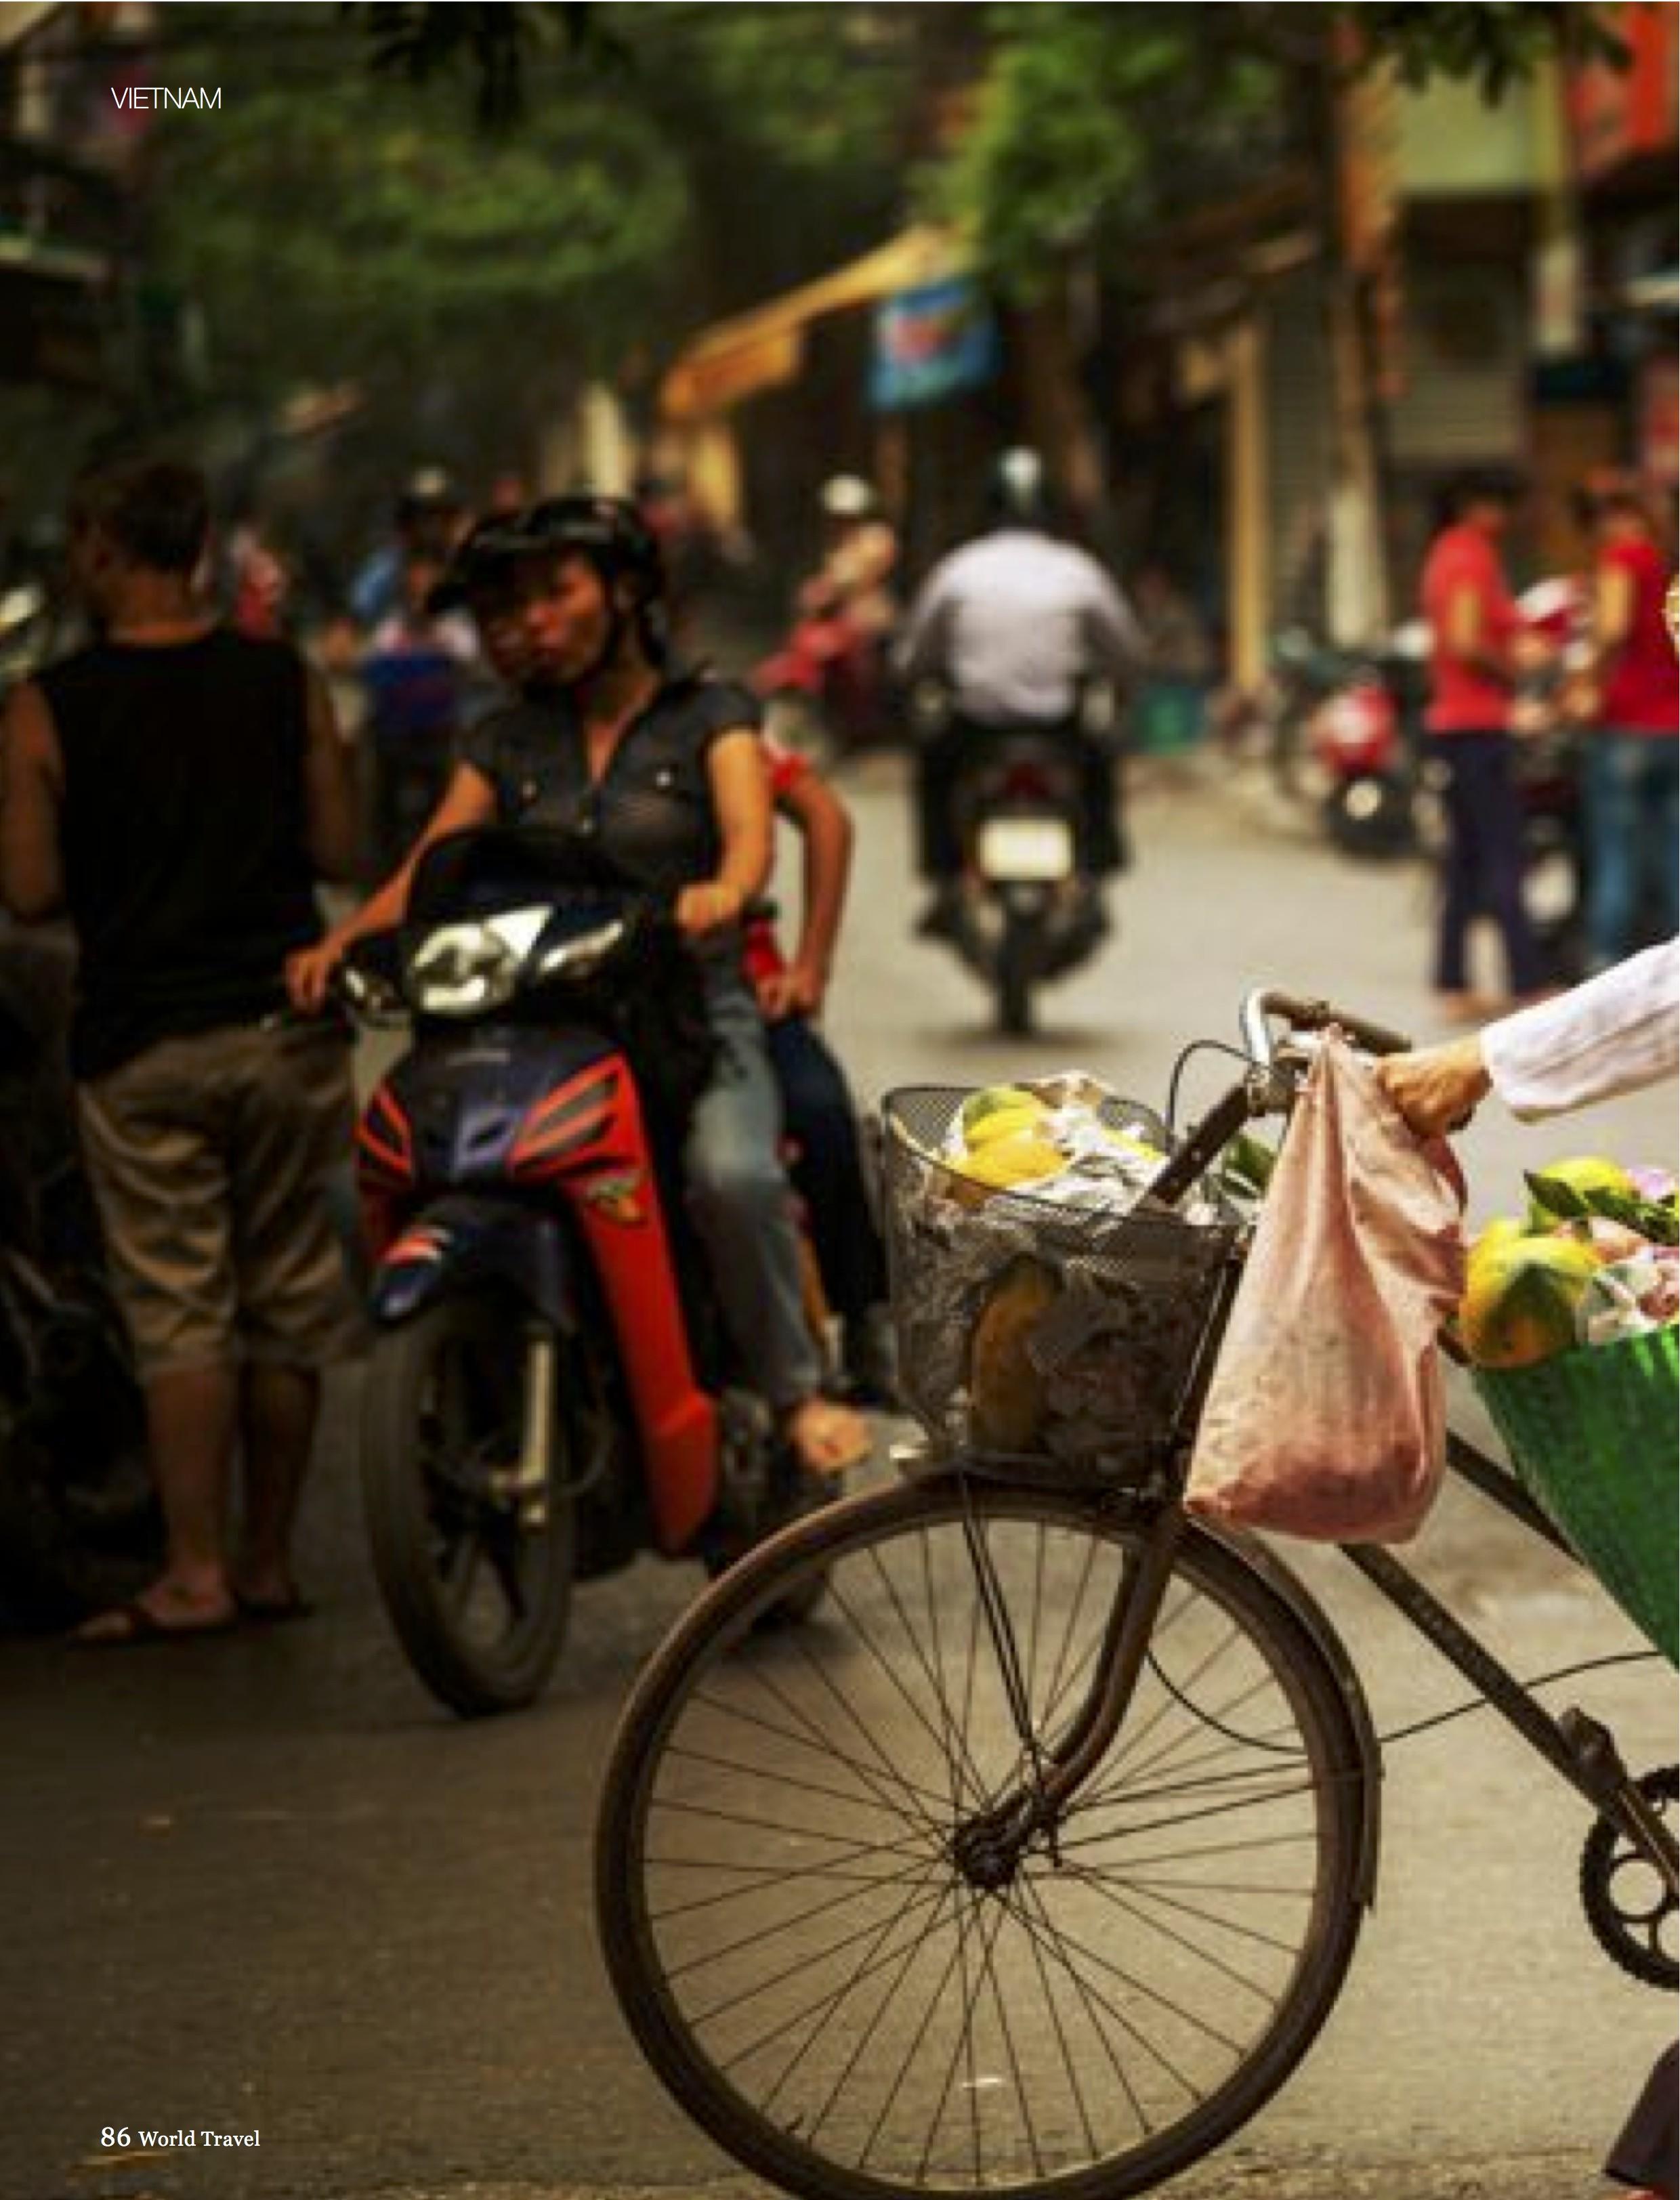 WTM_Vietnam_Damon-M-Banks_7